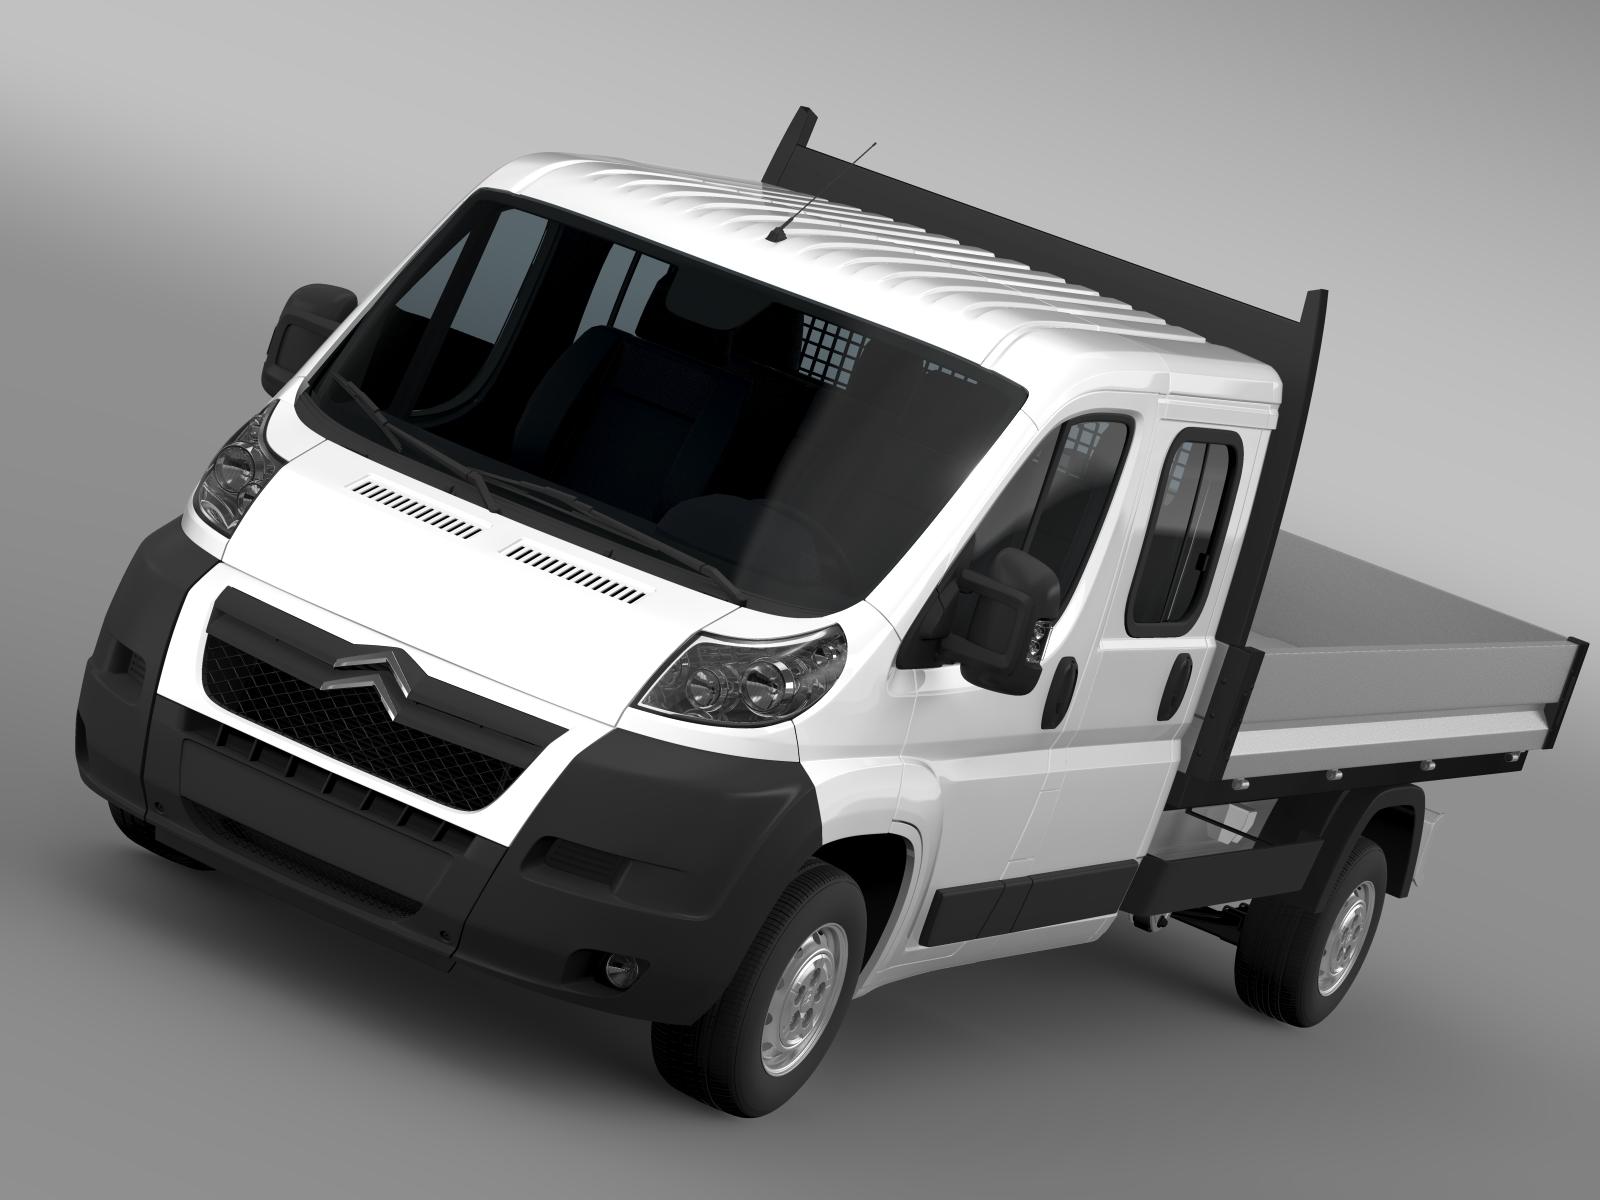 Citroen menyampaikan trak teksi kru 2009-2014 3d model 3ds max fbx c4d lwo ma mb hrc xsi obj 218682